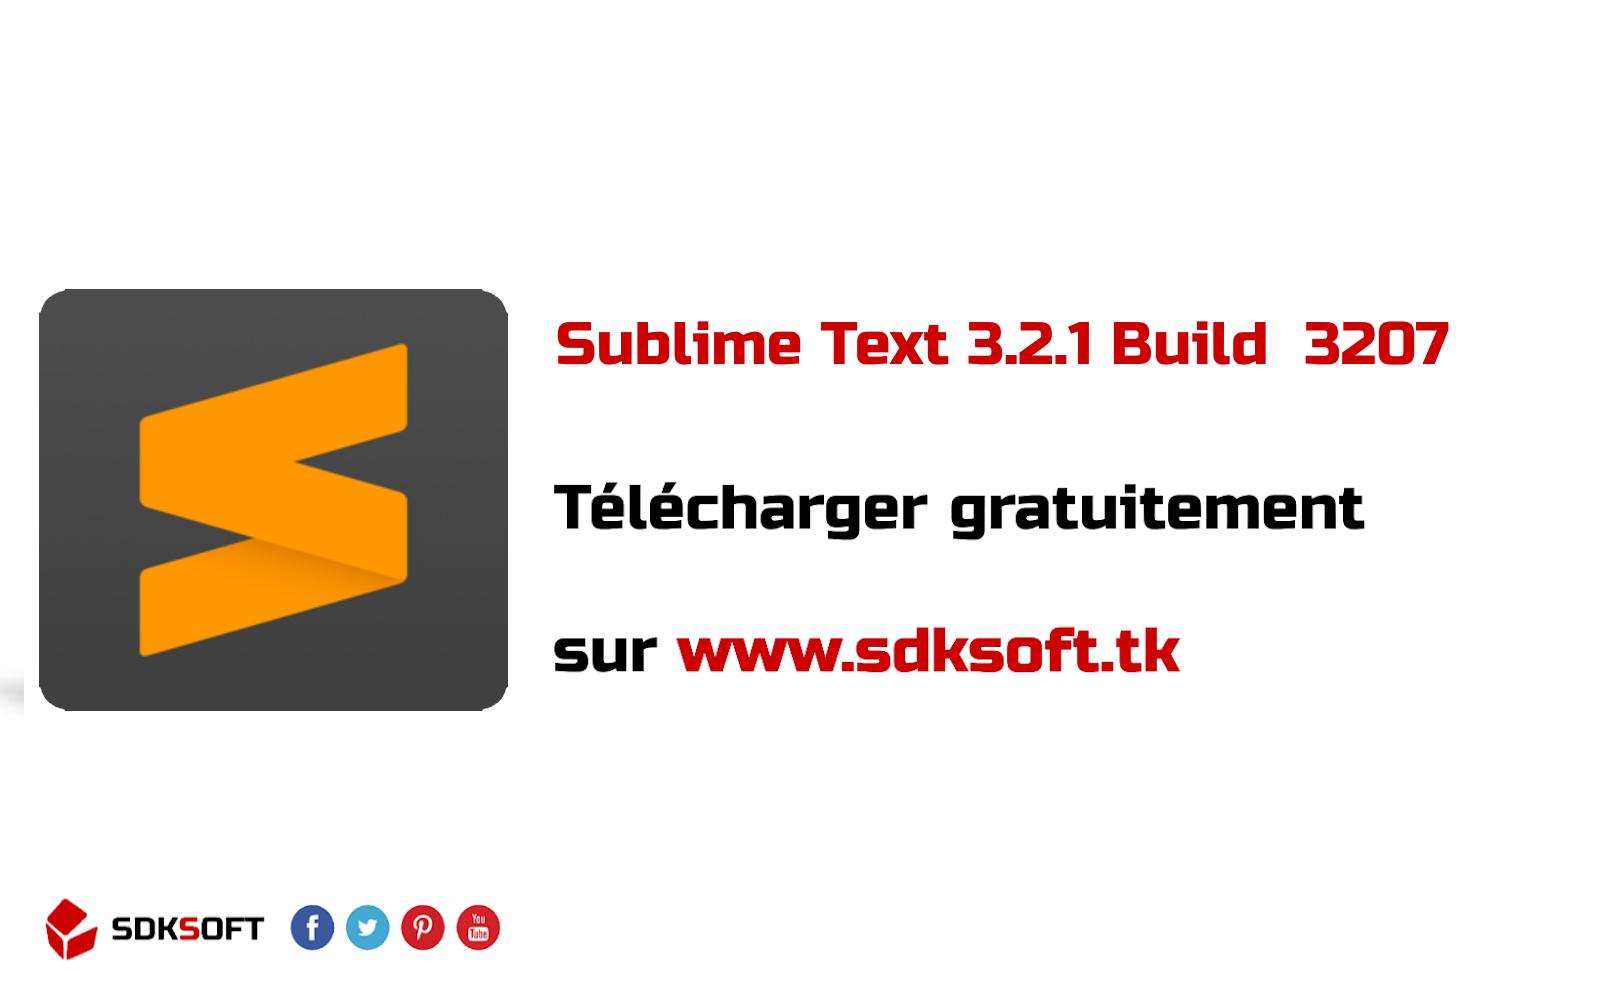 Sublime Text 3.2.1 Build 3207 (Dengan gambar)